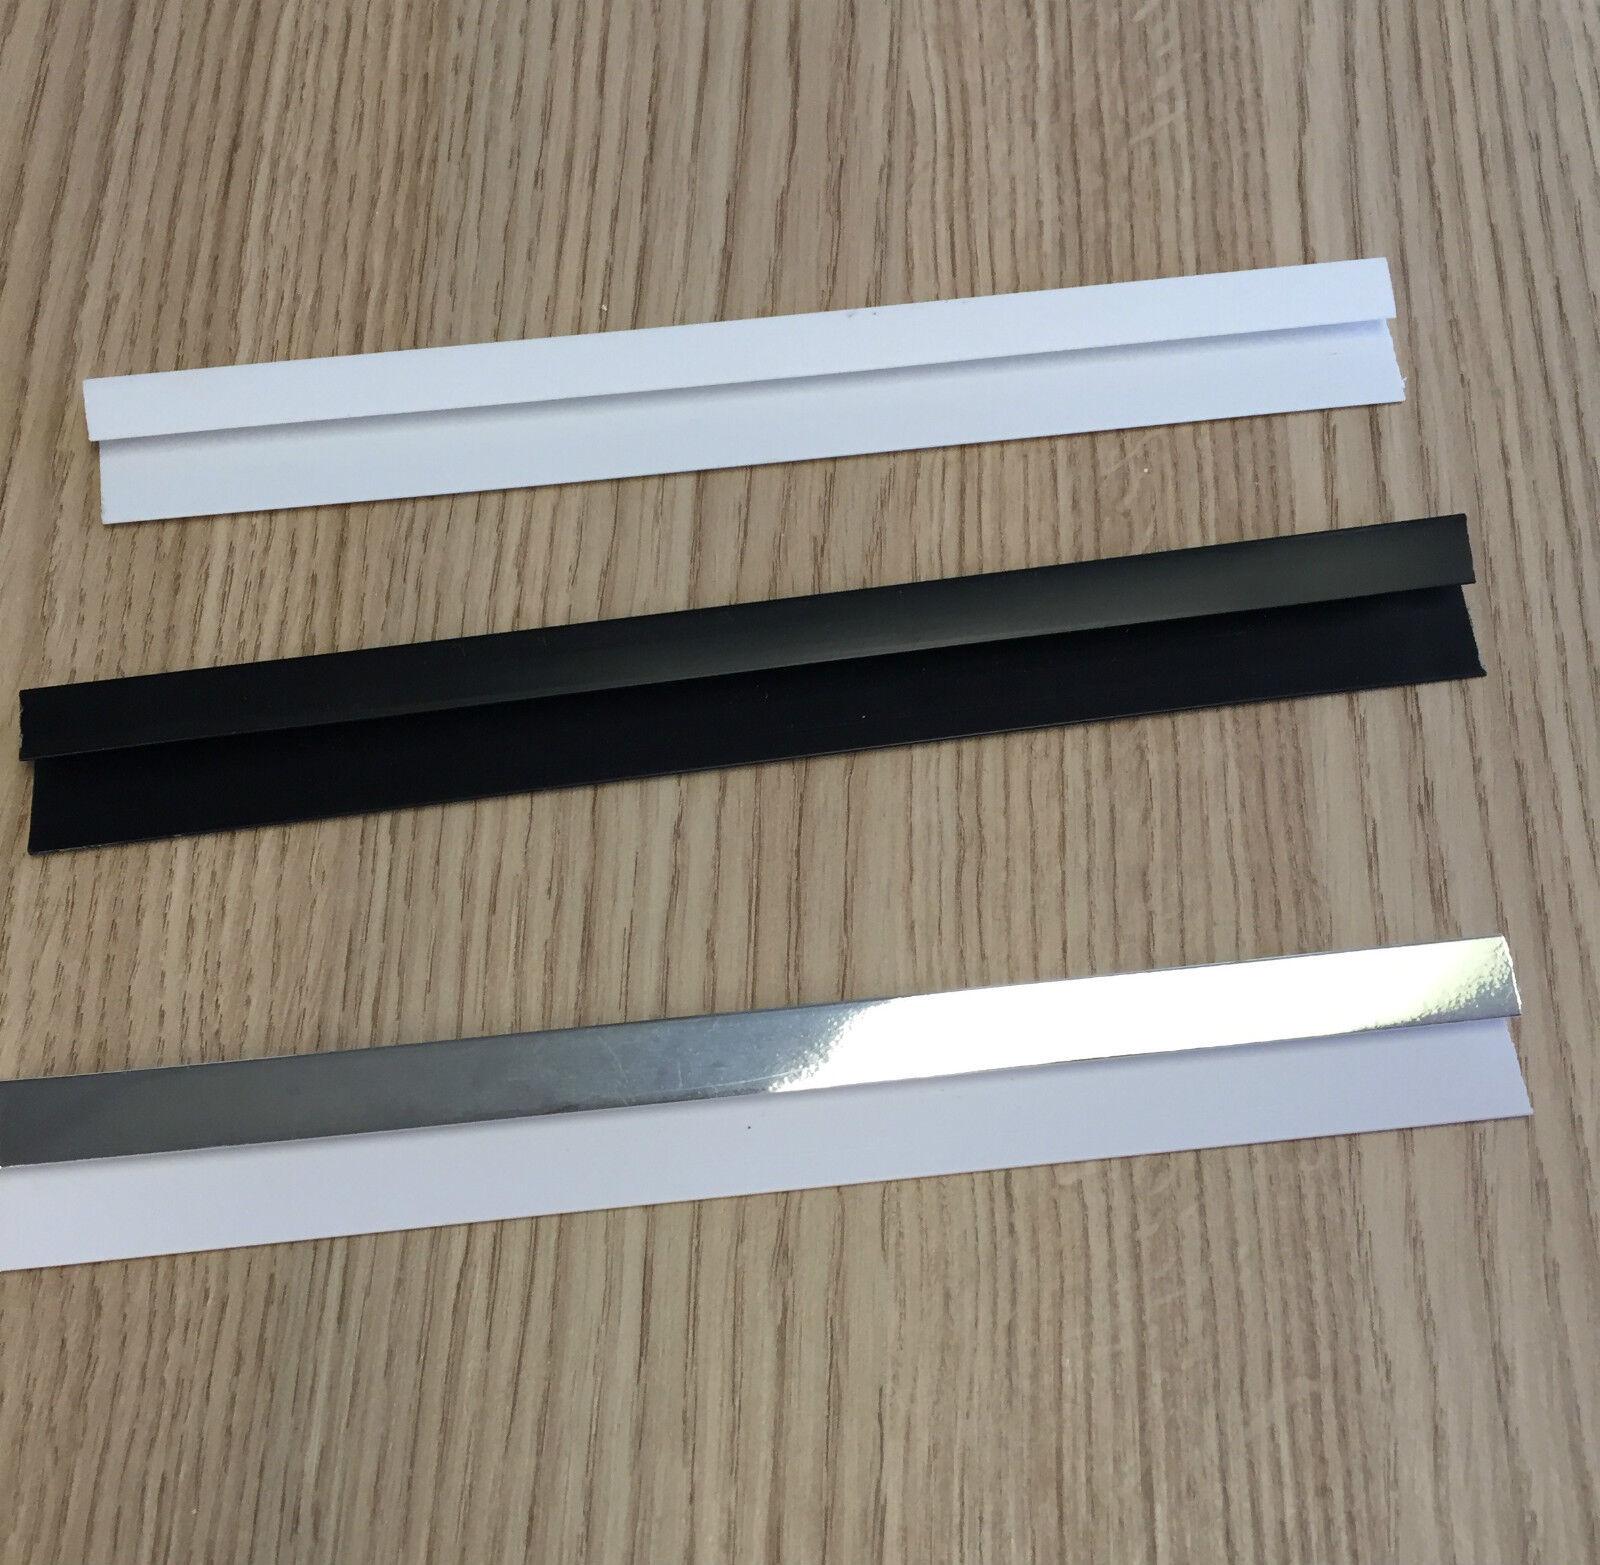 White End Cap Trim 2.6m Plastic PVC Wall Panels Cladding 5mm Silver Black